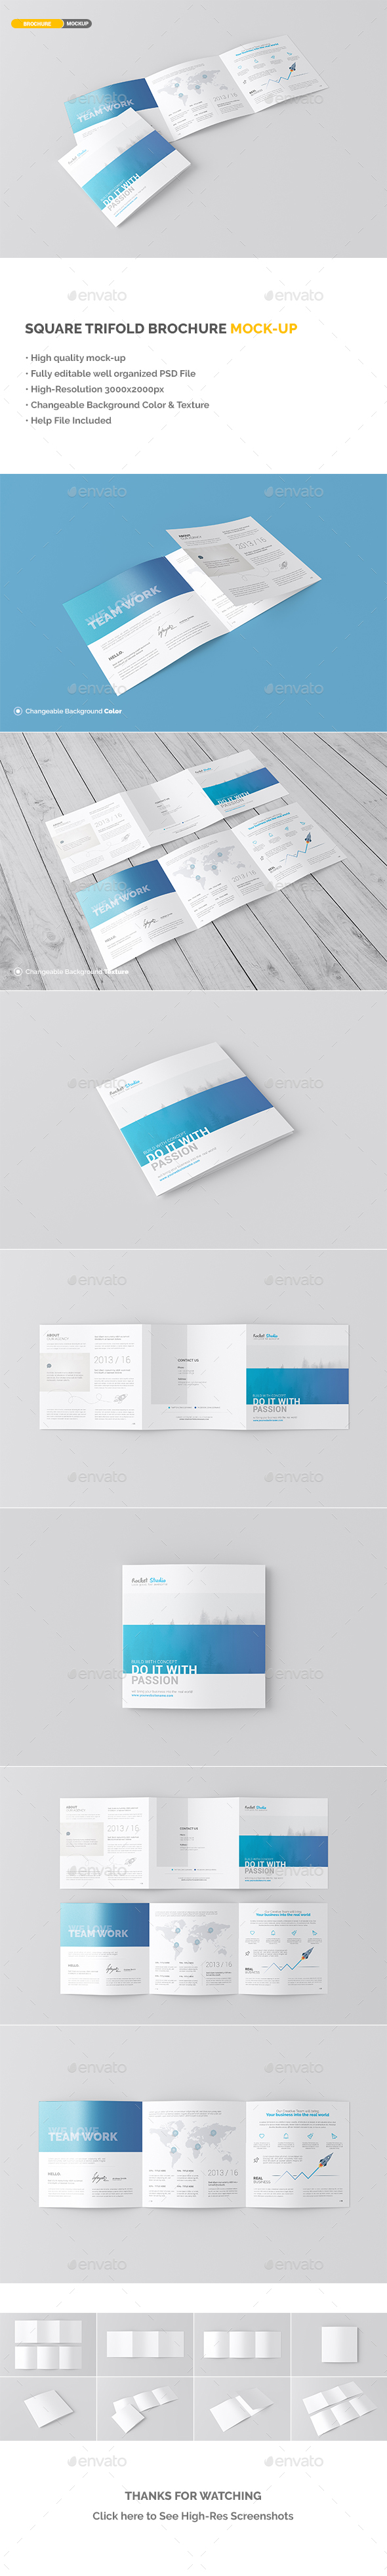 Square Trifold Brochure Mockup | Brochures